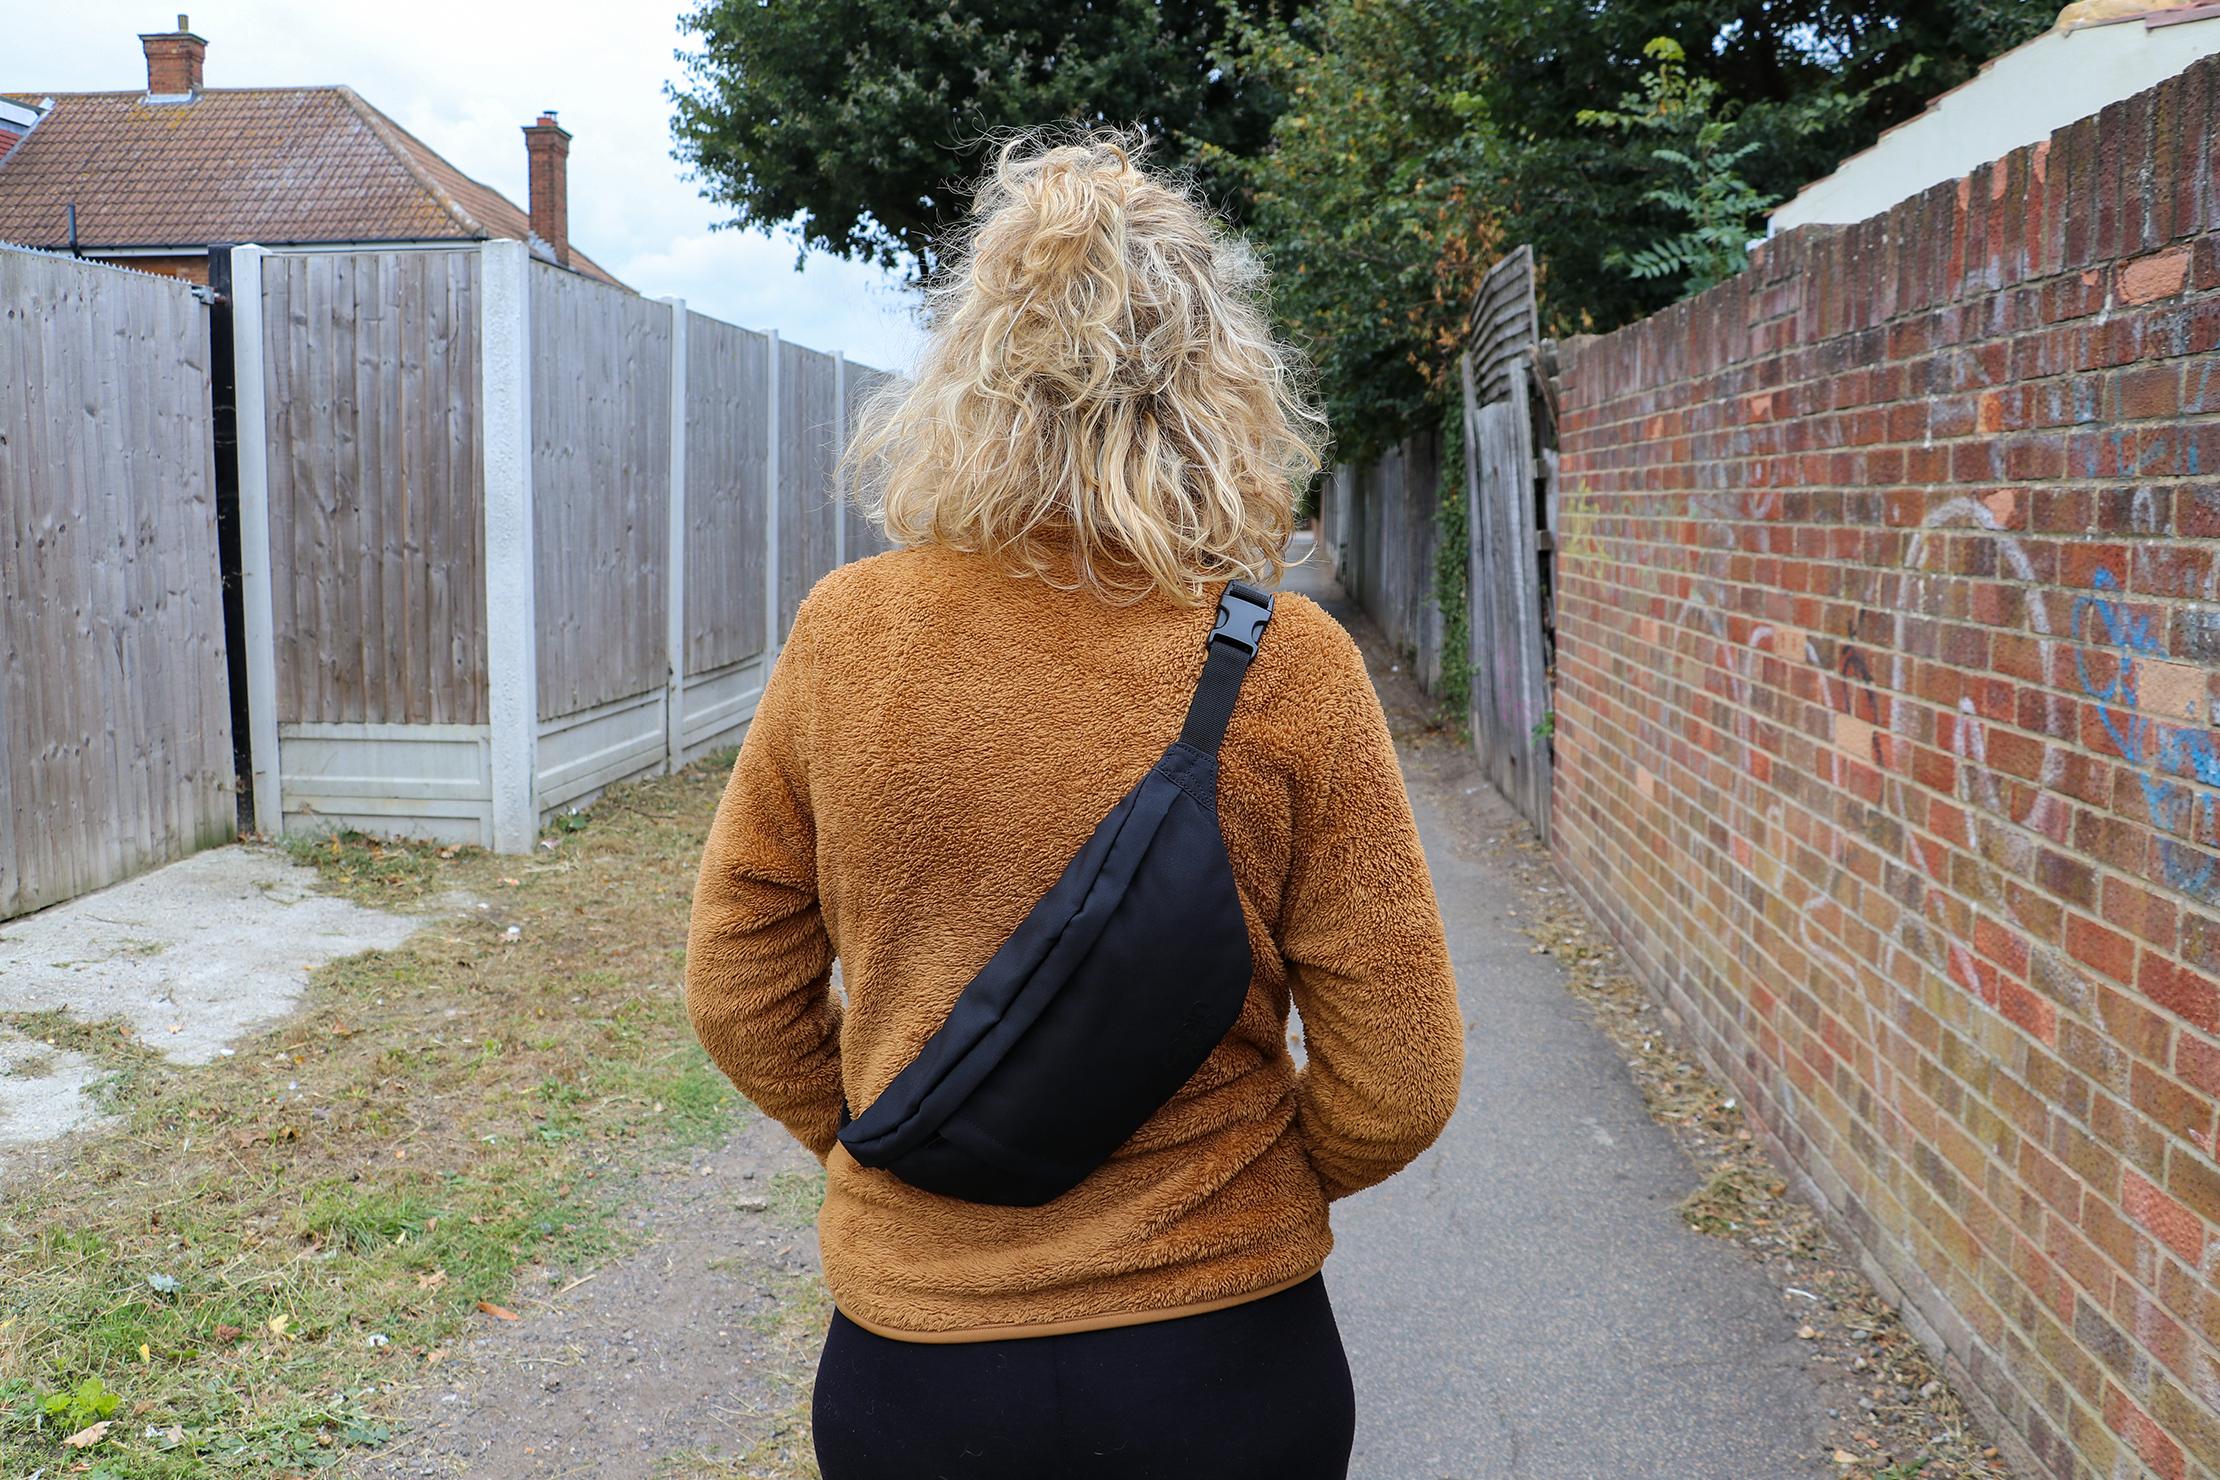 CabinZero Hip Pack 2L On Rebecca In Essex, England